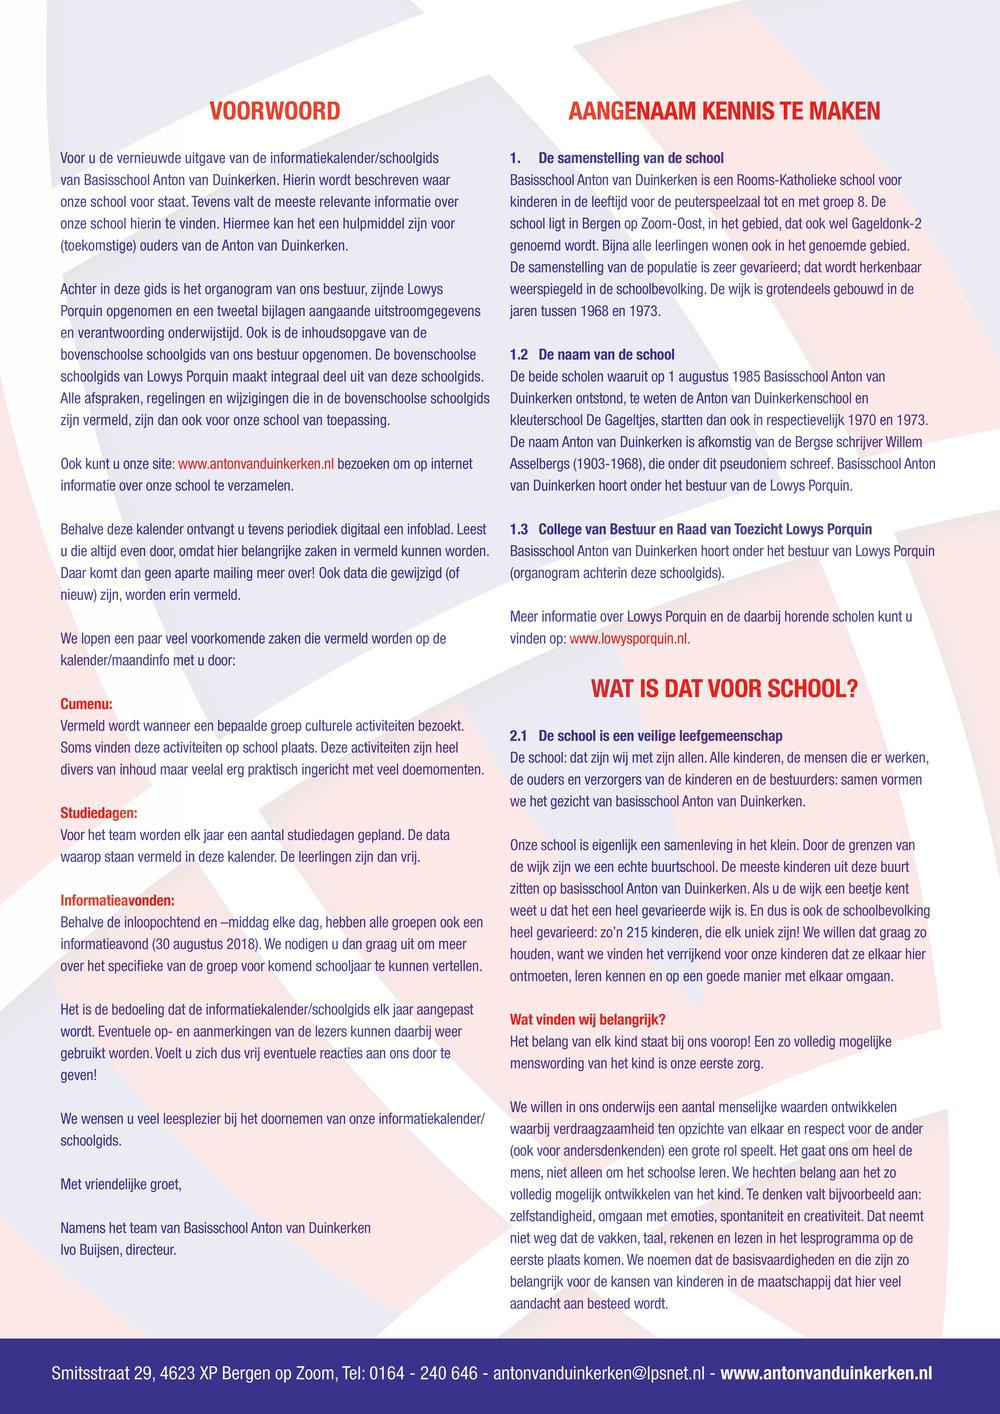 ZandBij_AVD_Schoolgids_kalender2.jpg